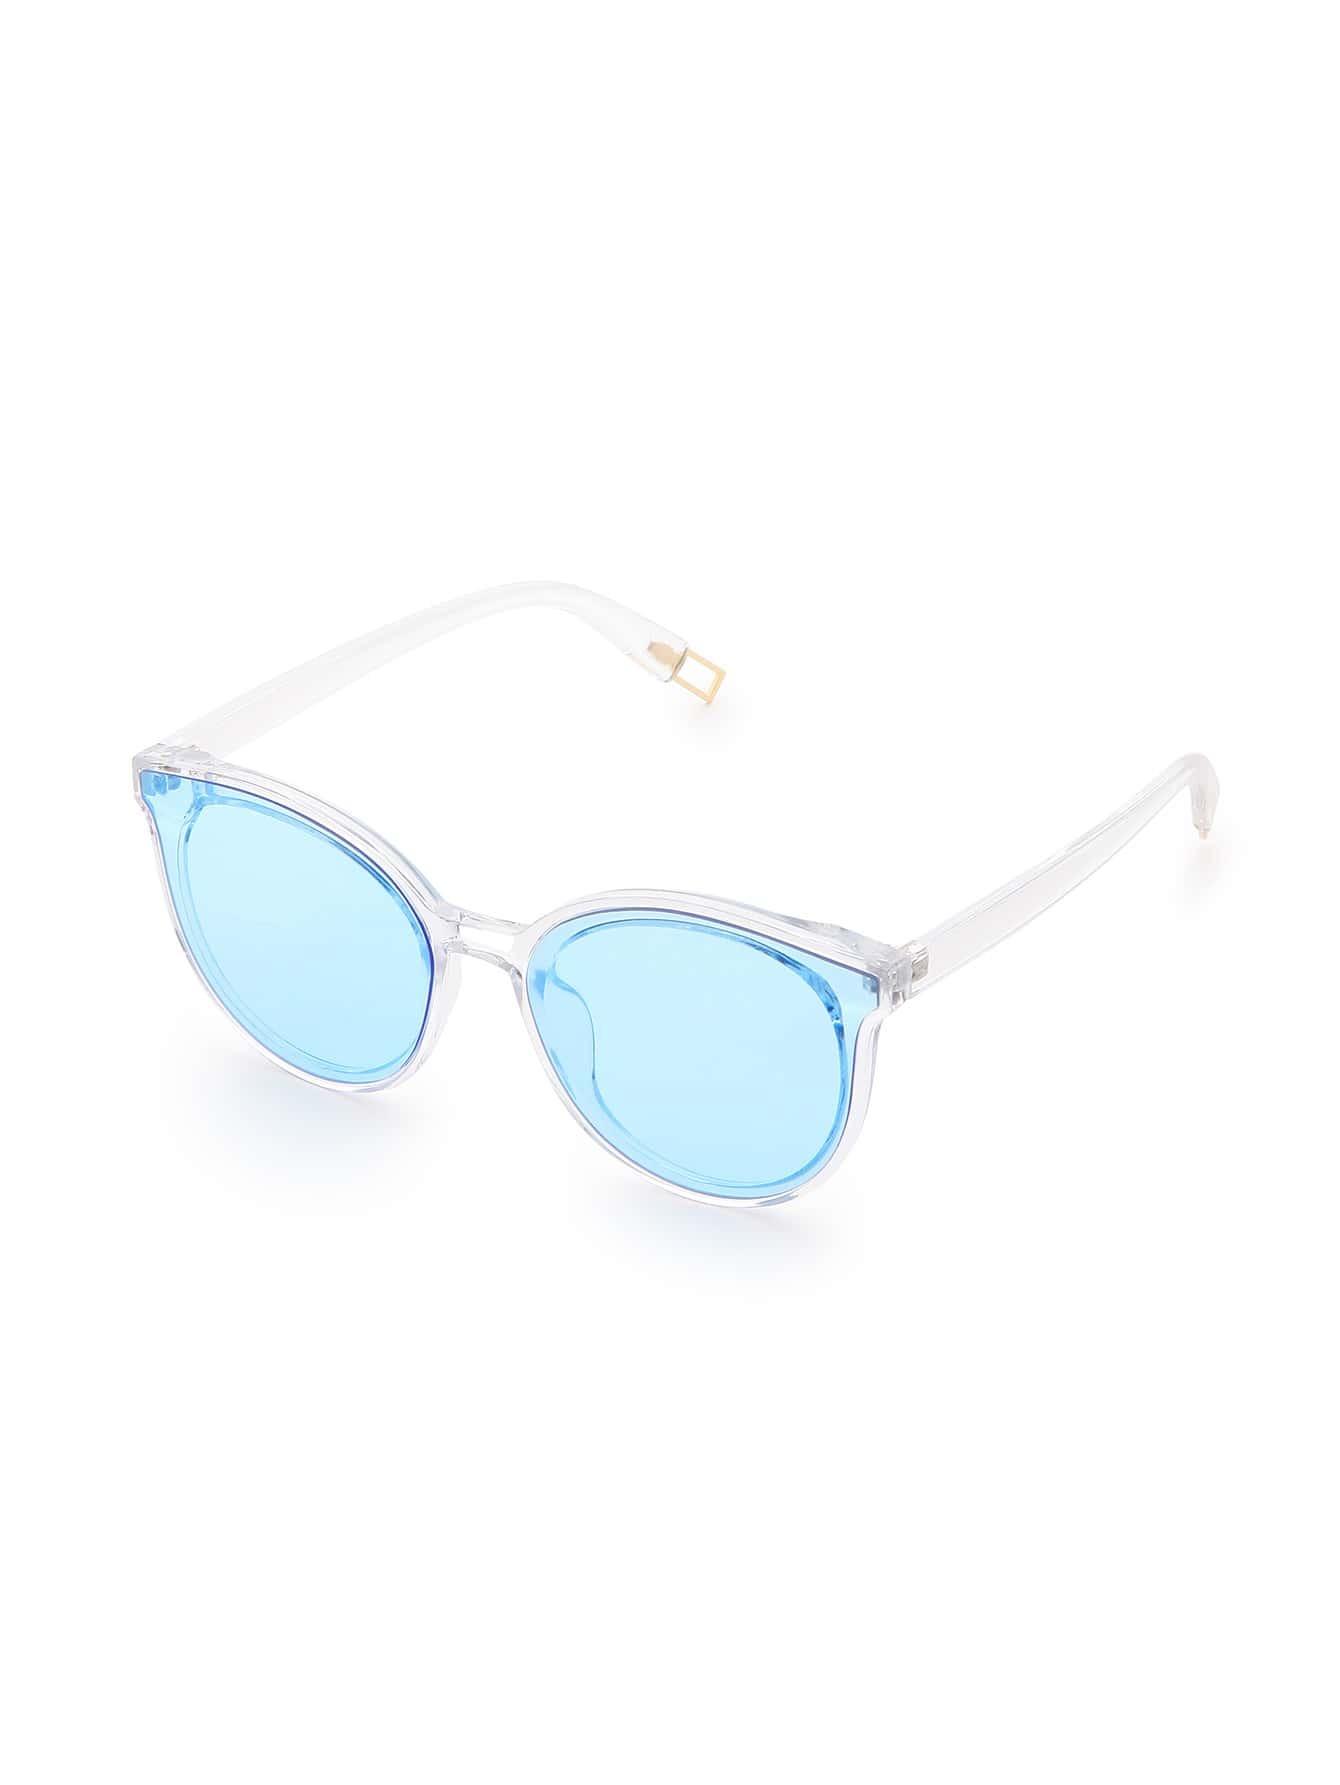 Clear Frame Blue Lens Sunglasses